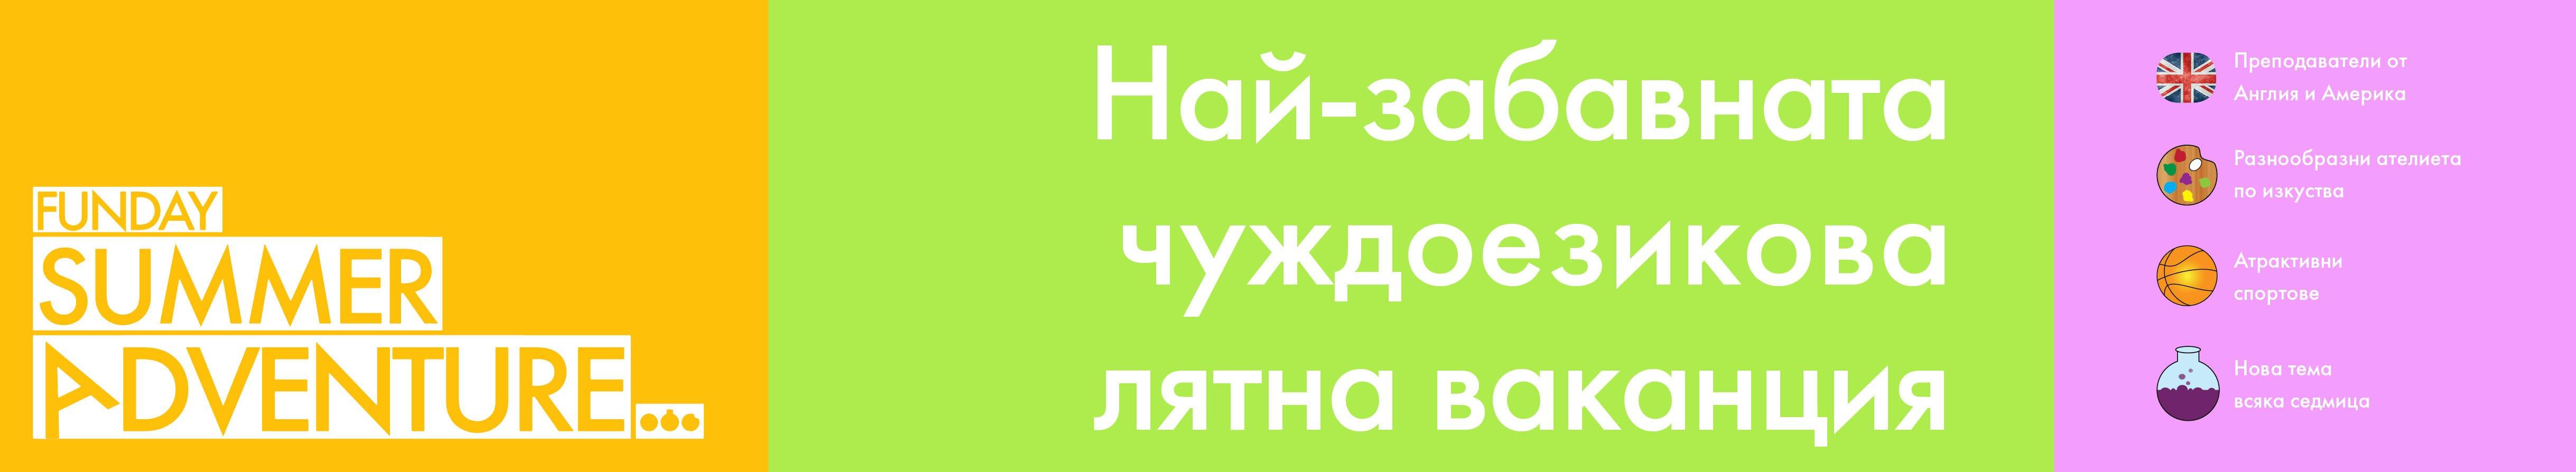 FSA banner